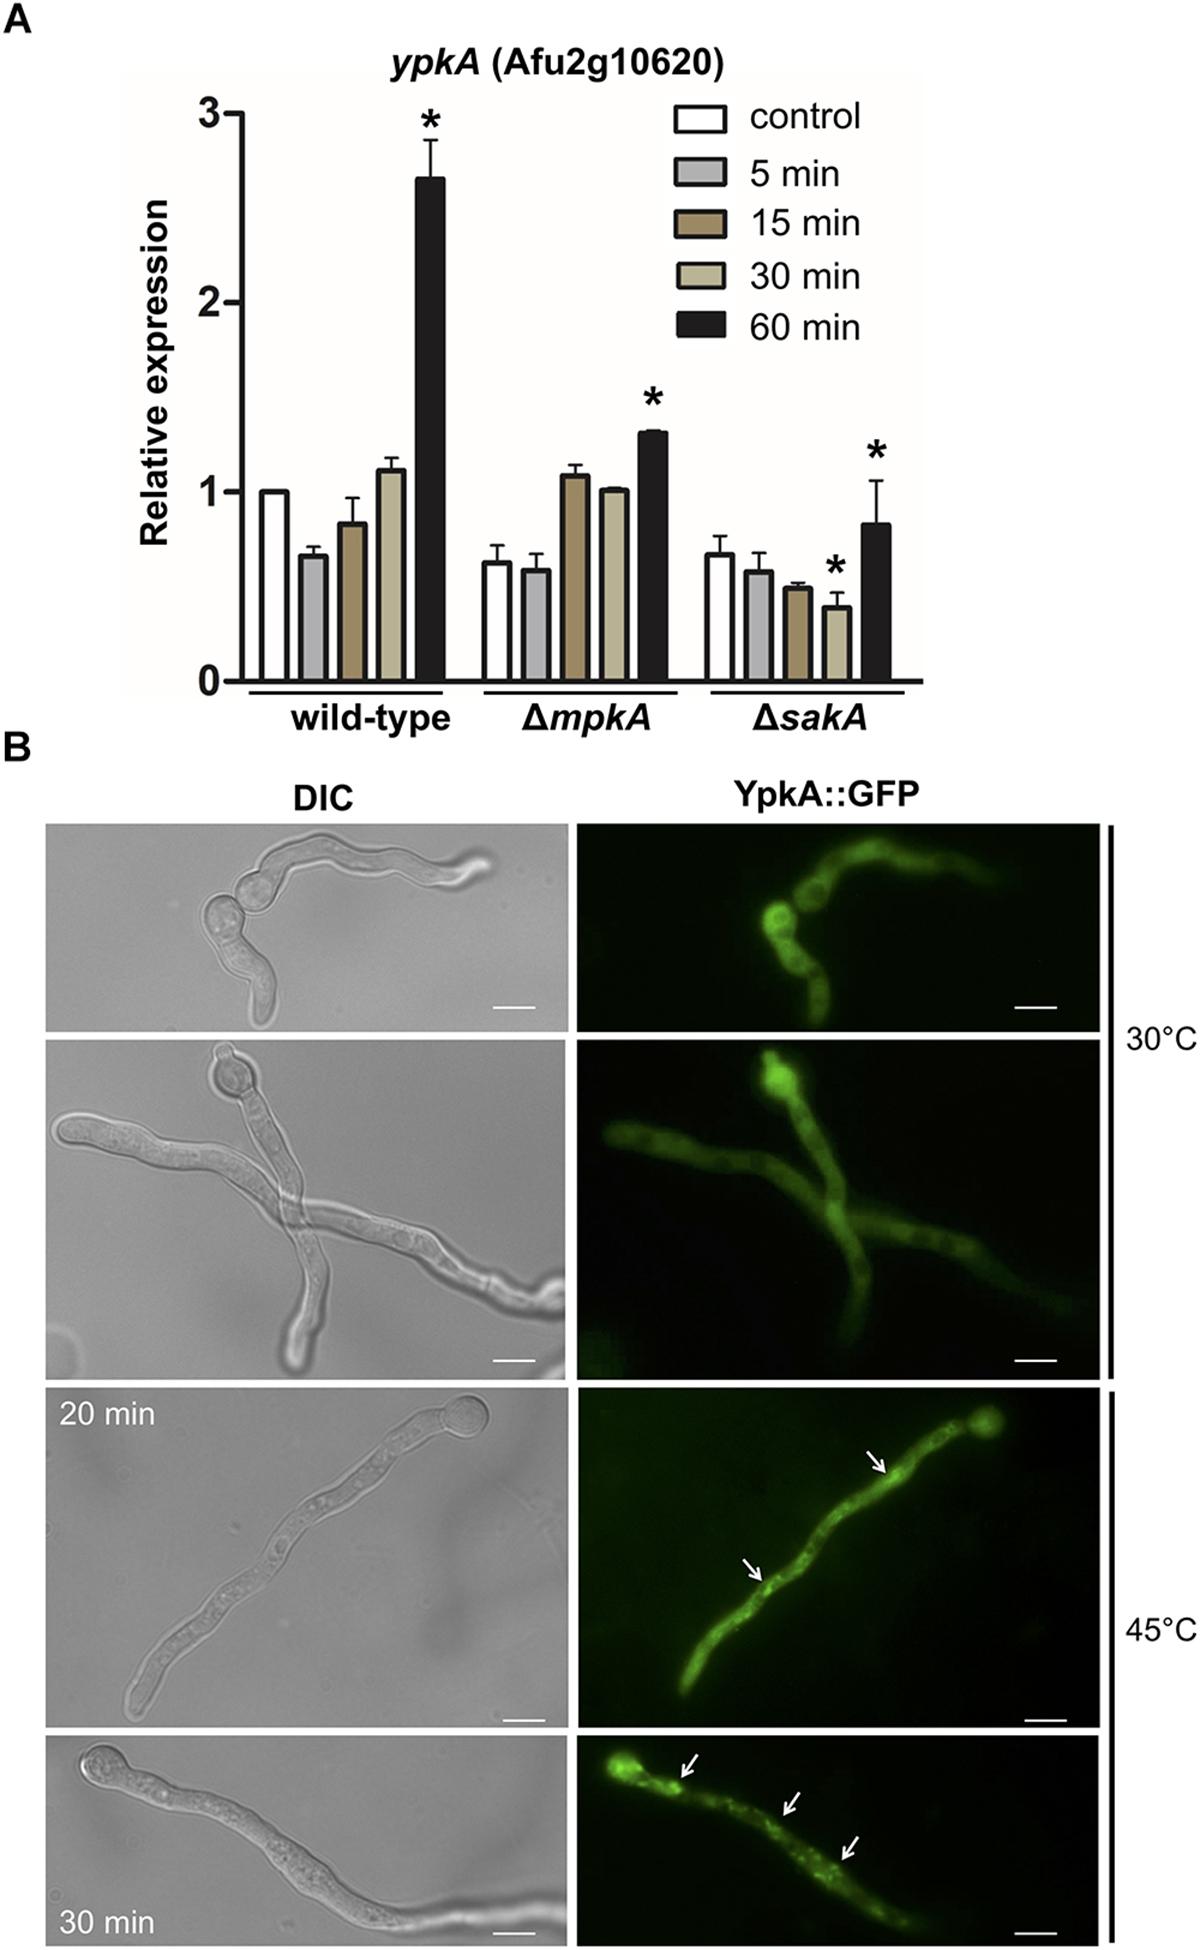 Frontiers | The AGC Kinase YpkA Regulates Sphingolipids Biosynthesis